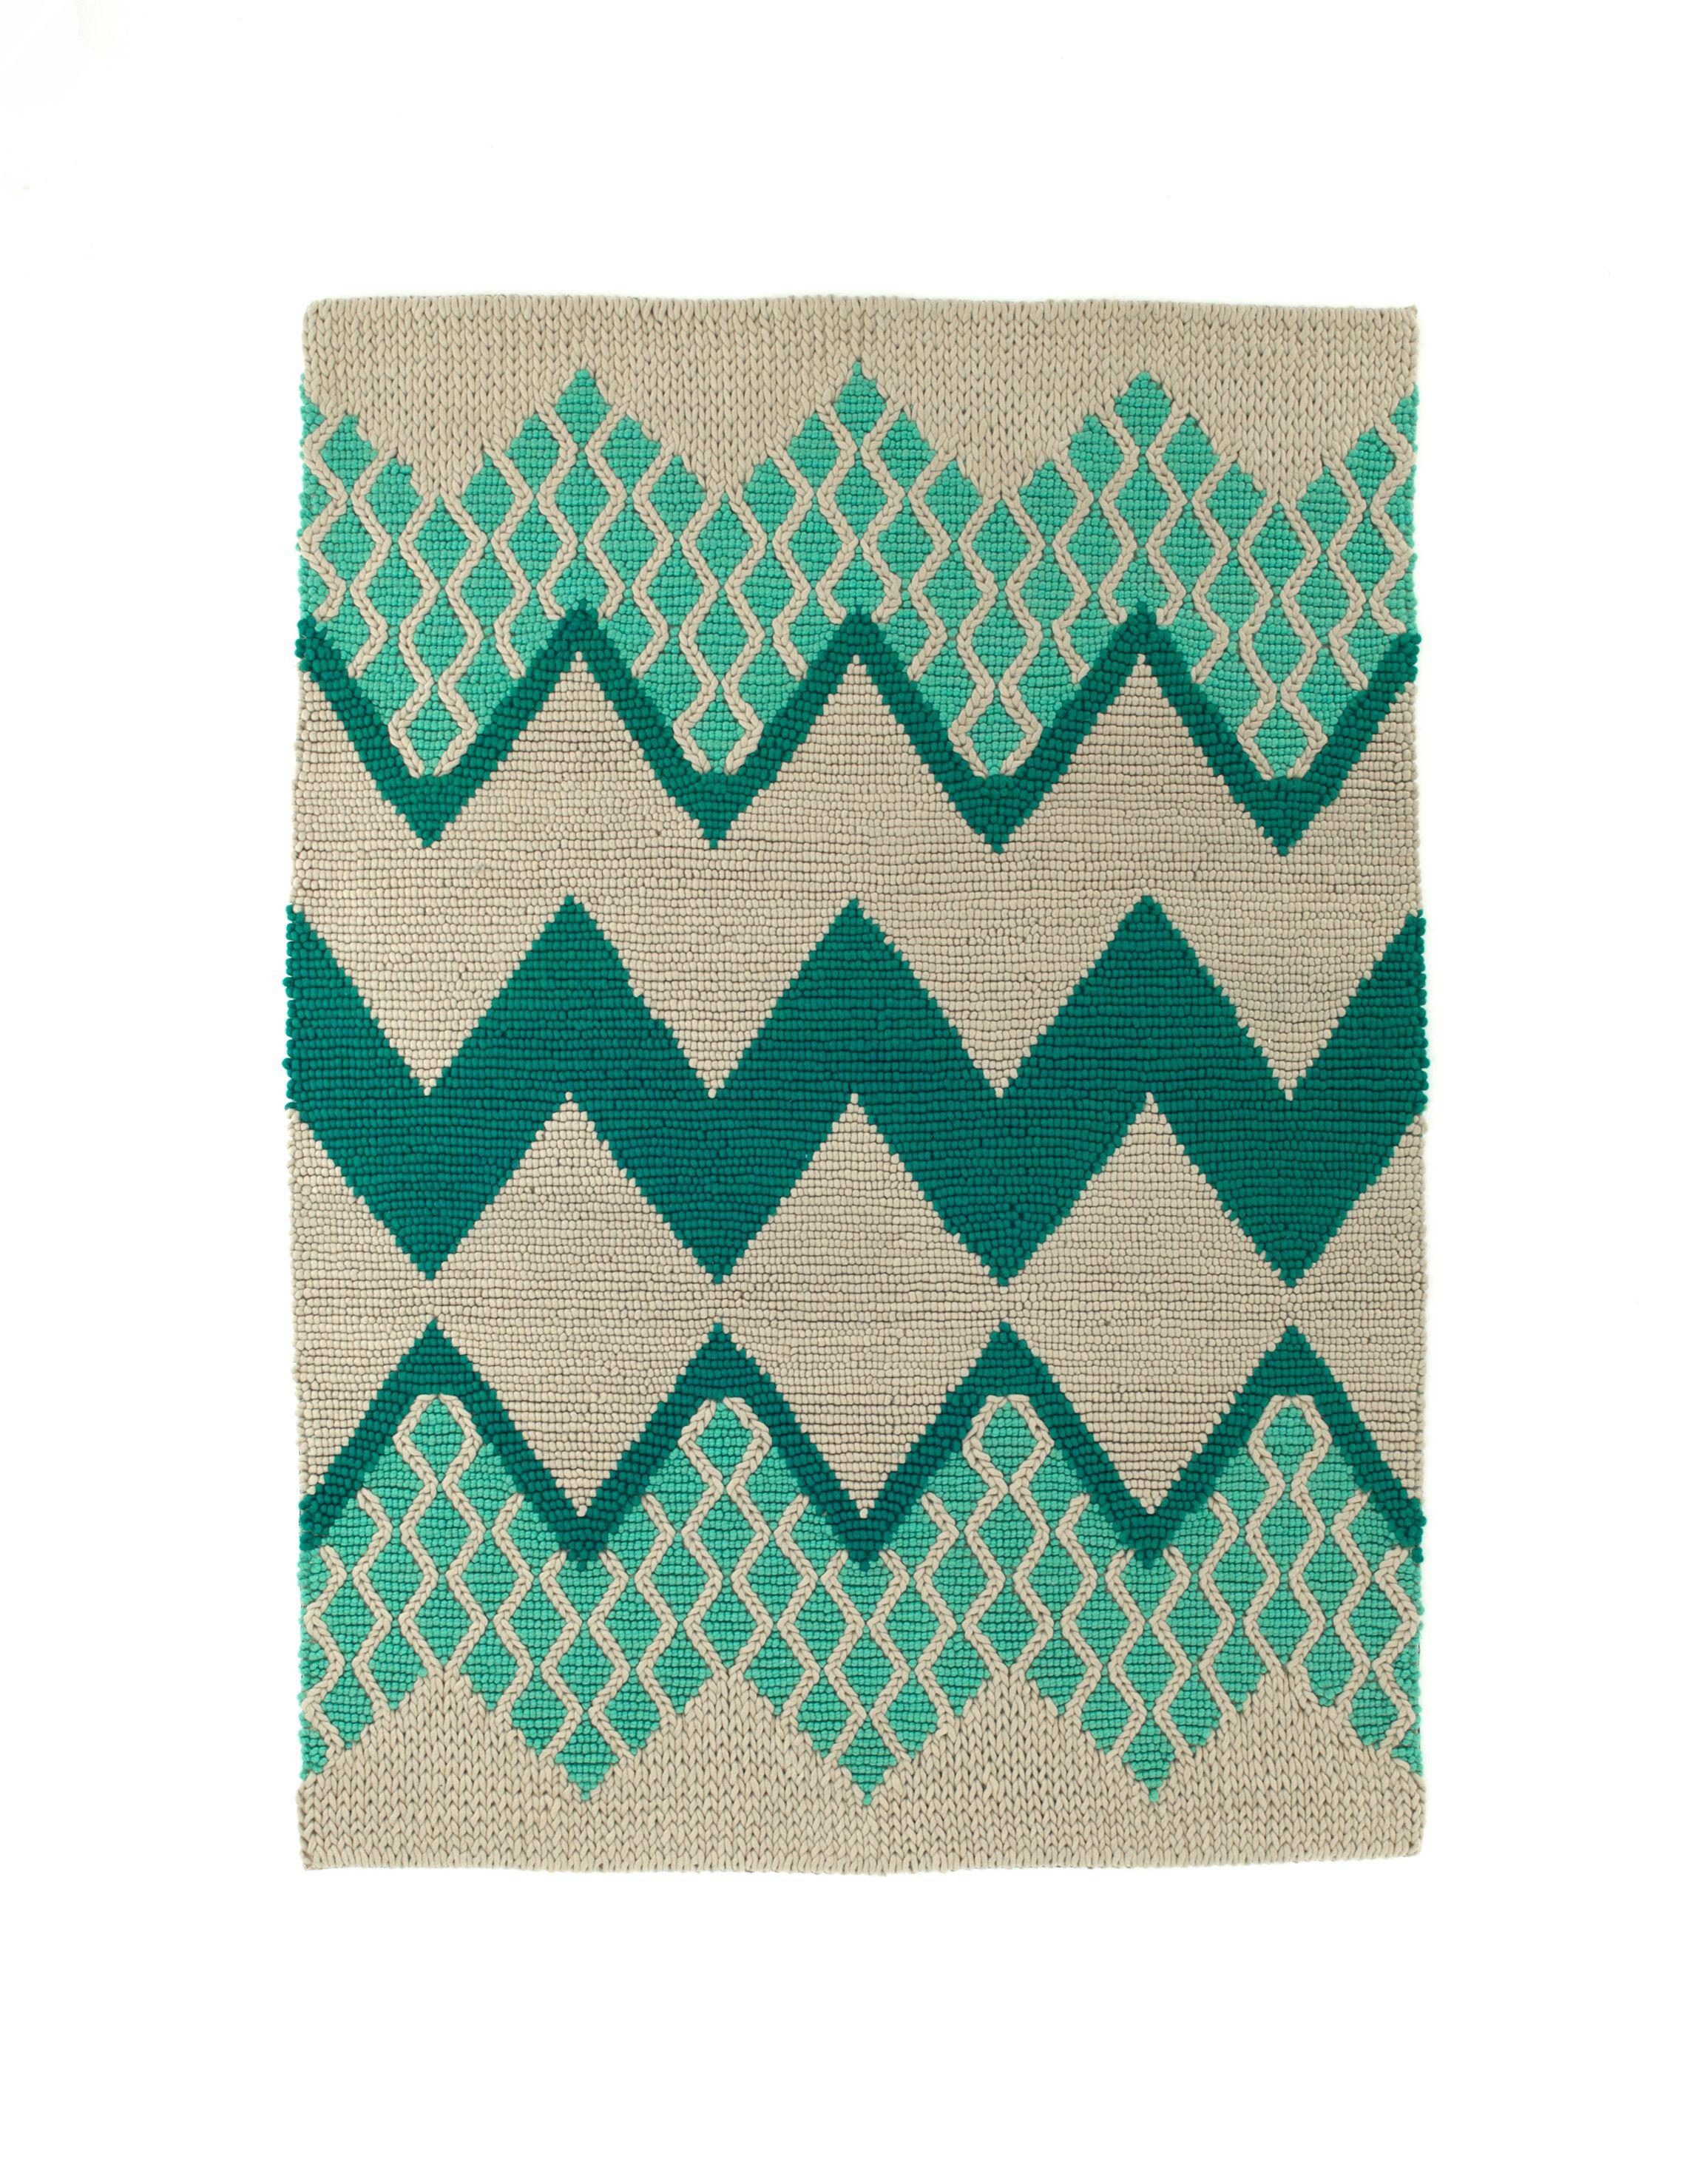 Pin On Rugs Tsty Fabric